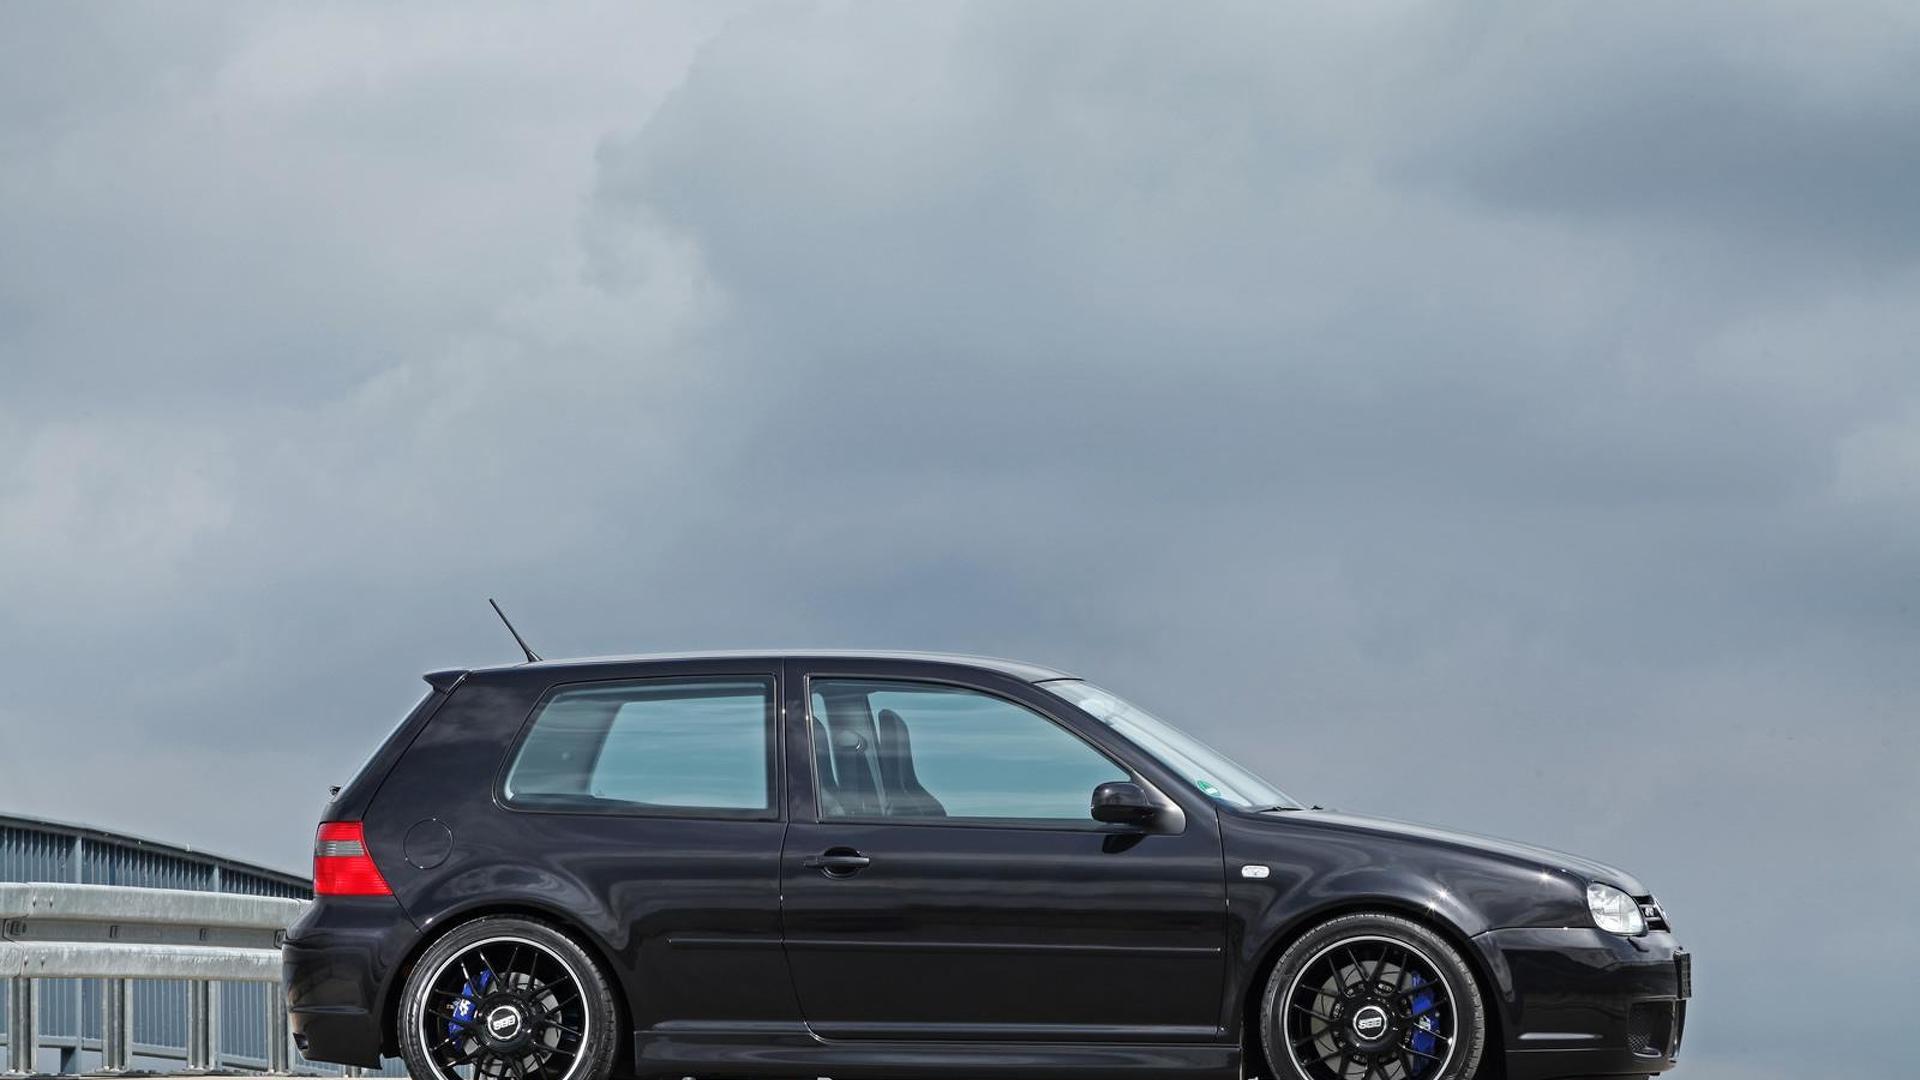 Быстрый Volkswagen Golf IV R32. Тюнинг от HPerformance